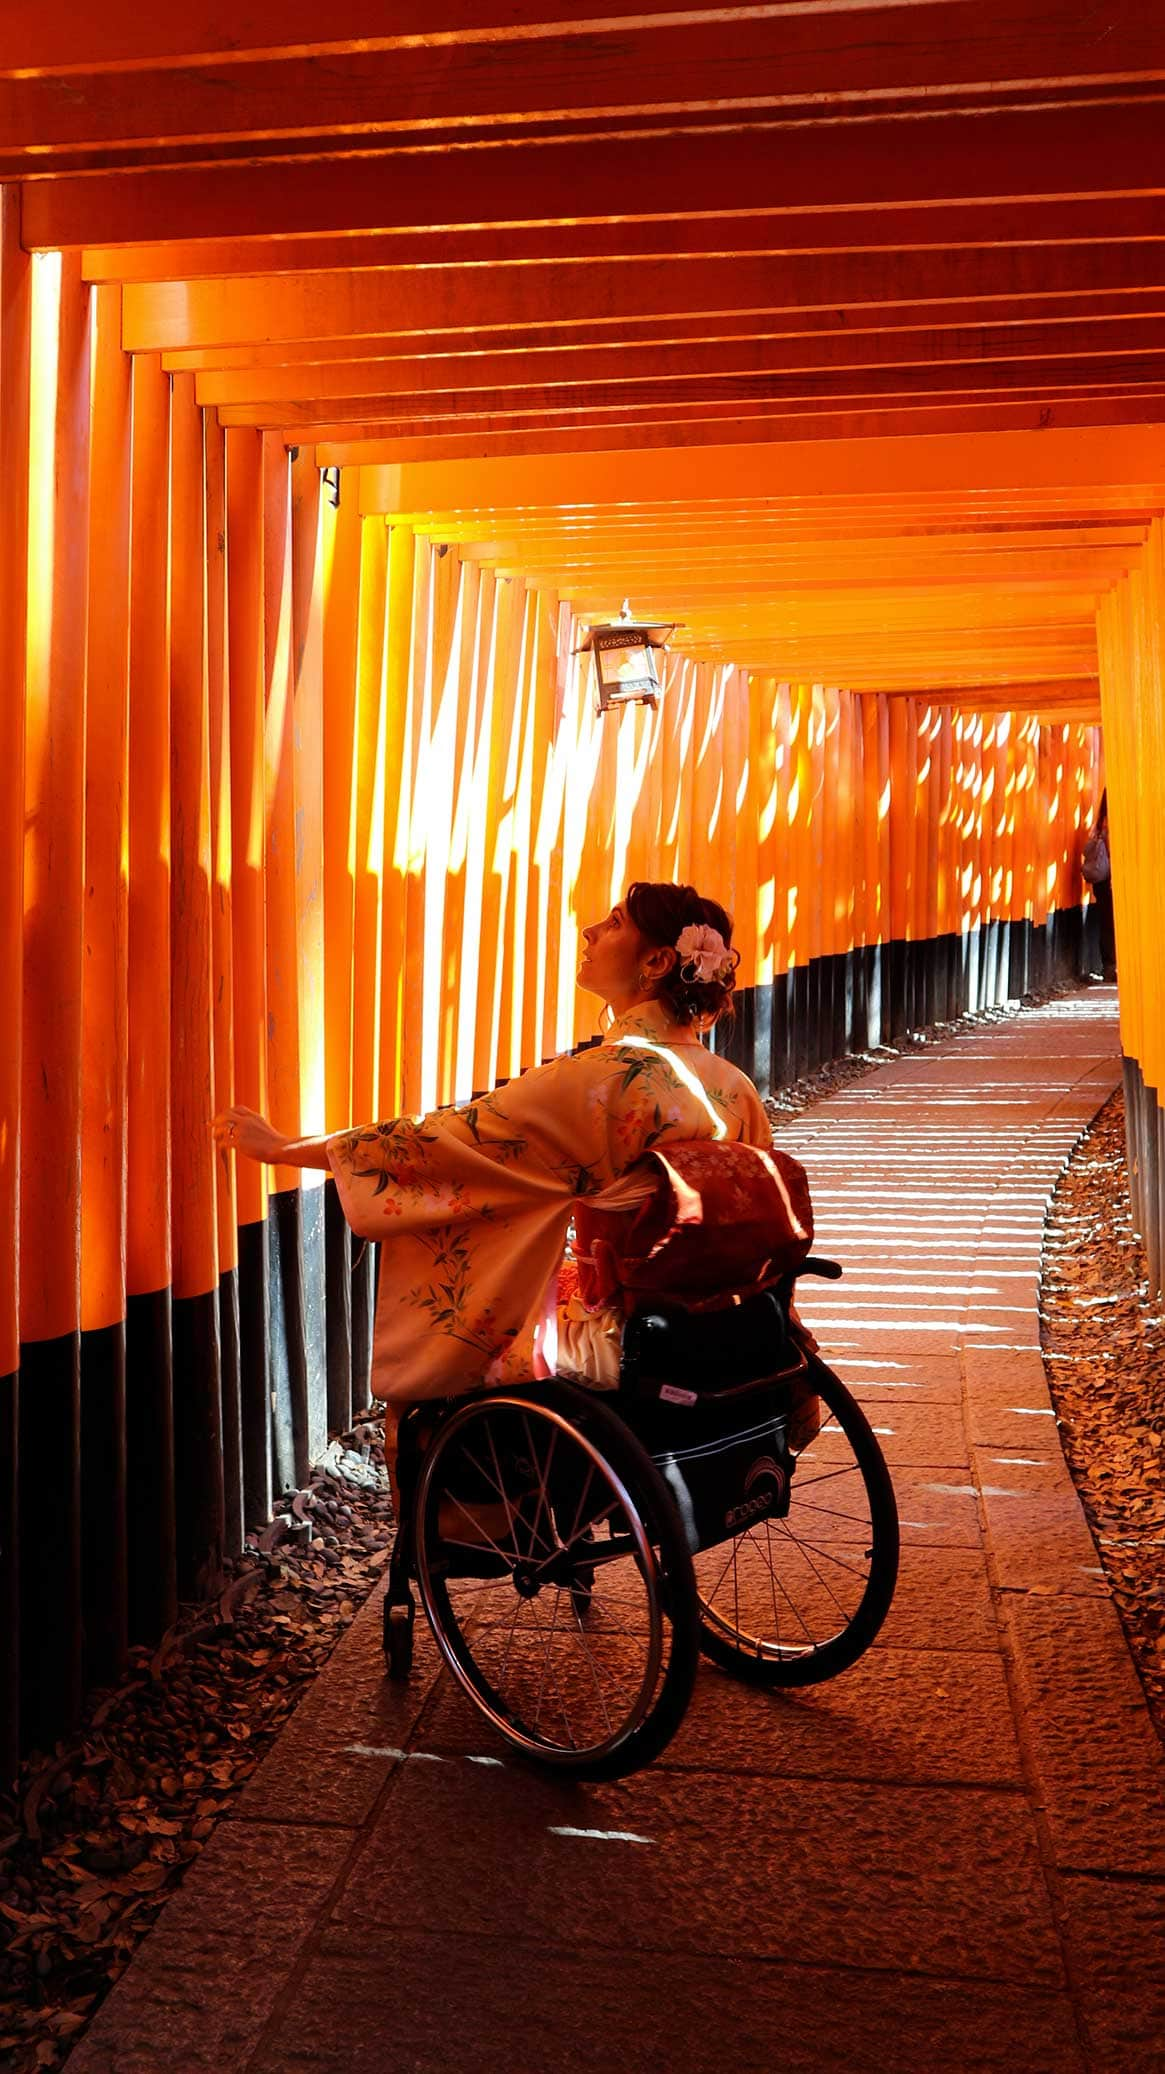 kyoto trip to japan